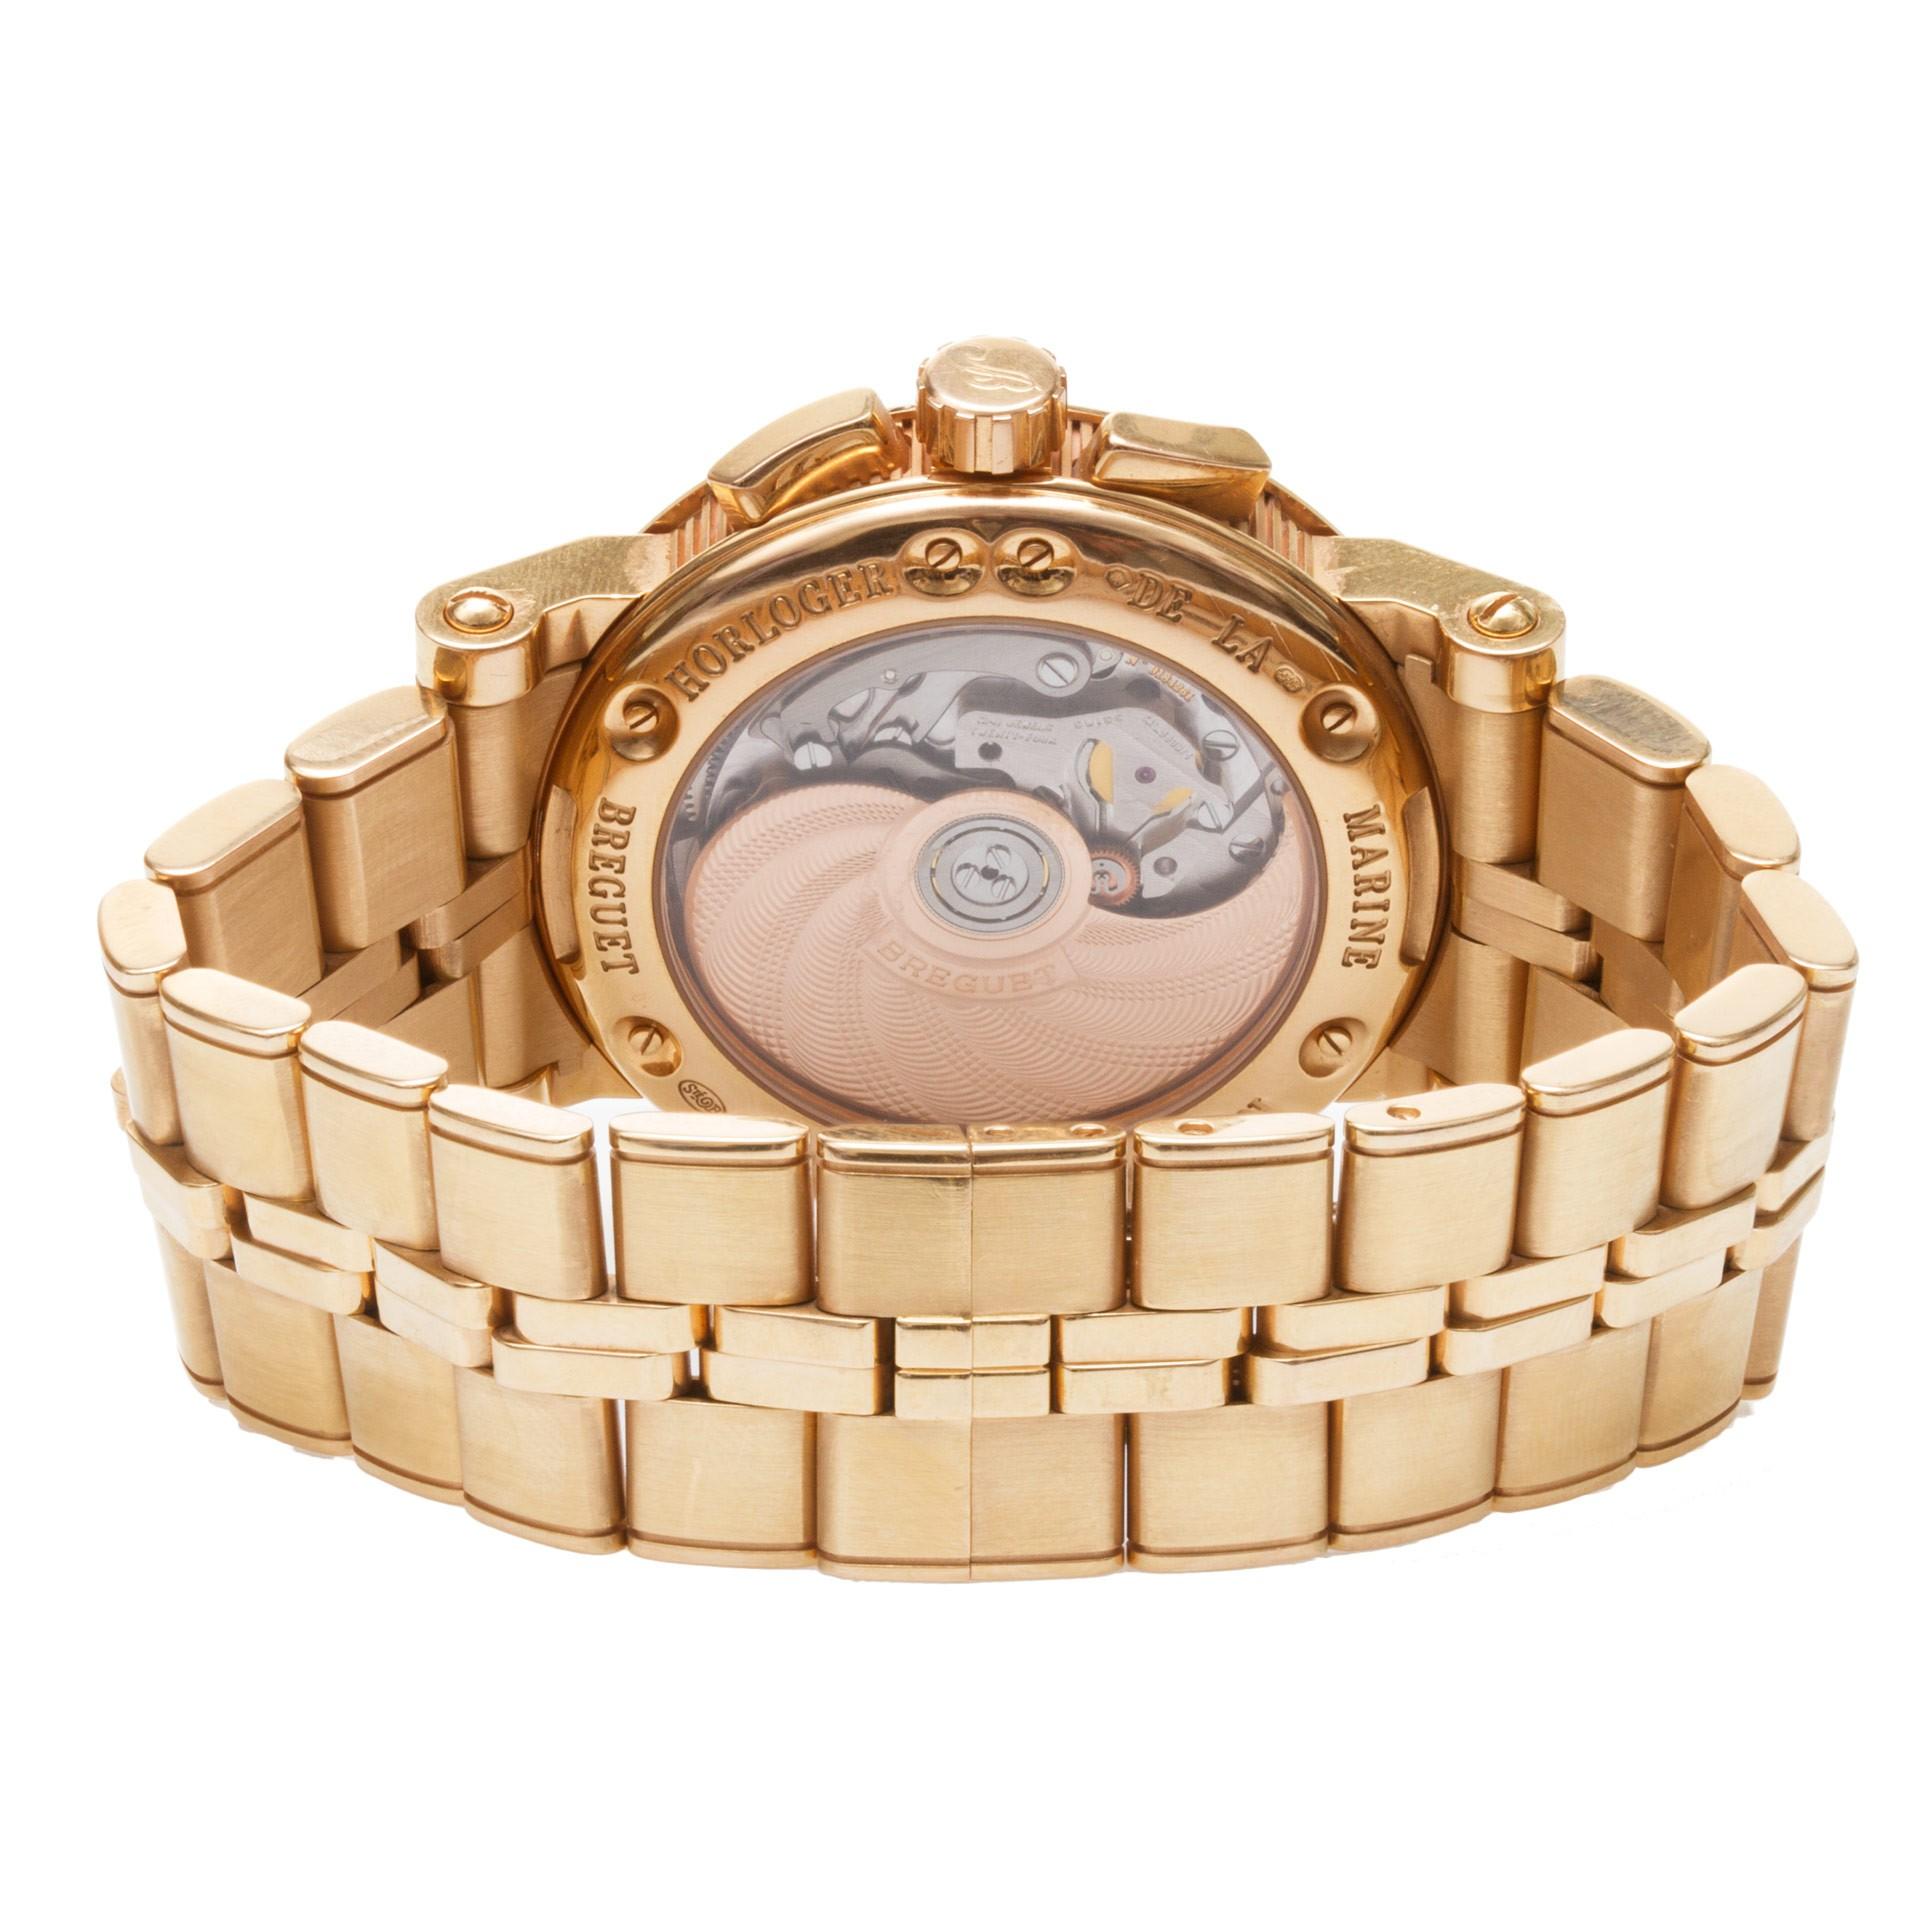 Breguet Watches: Marine Chronograph 5827